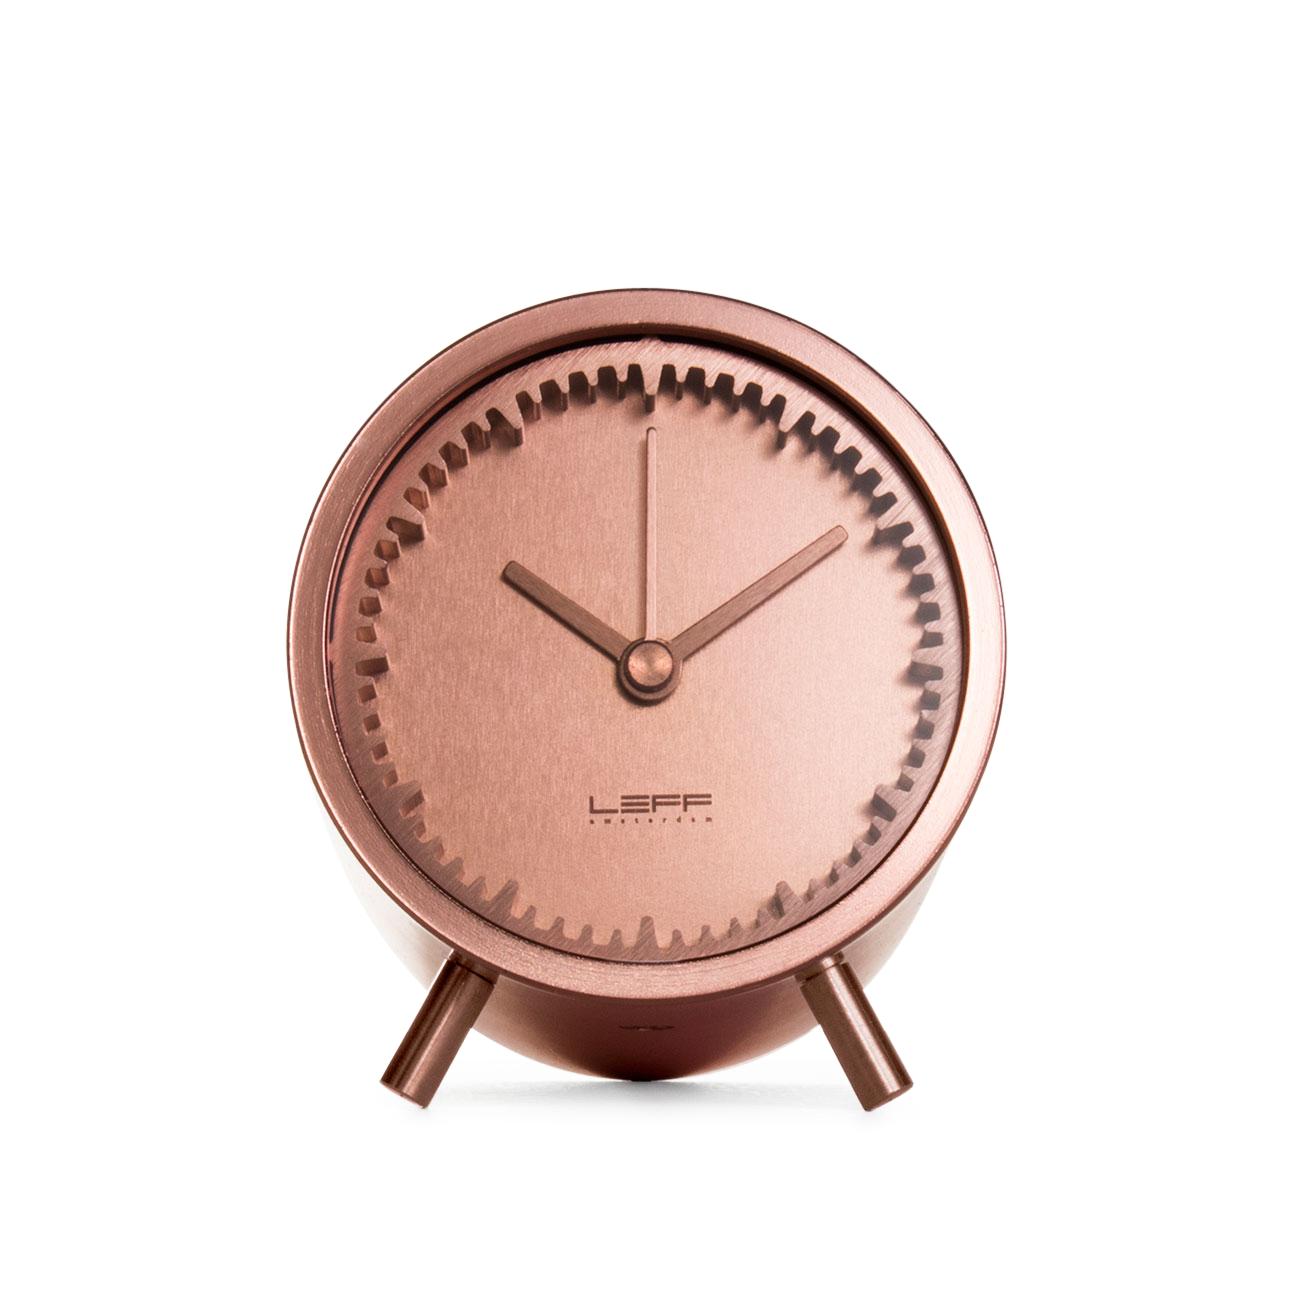 Leff Amsterdam & Piet Hein Eek's Tube Clock, Copper